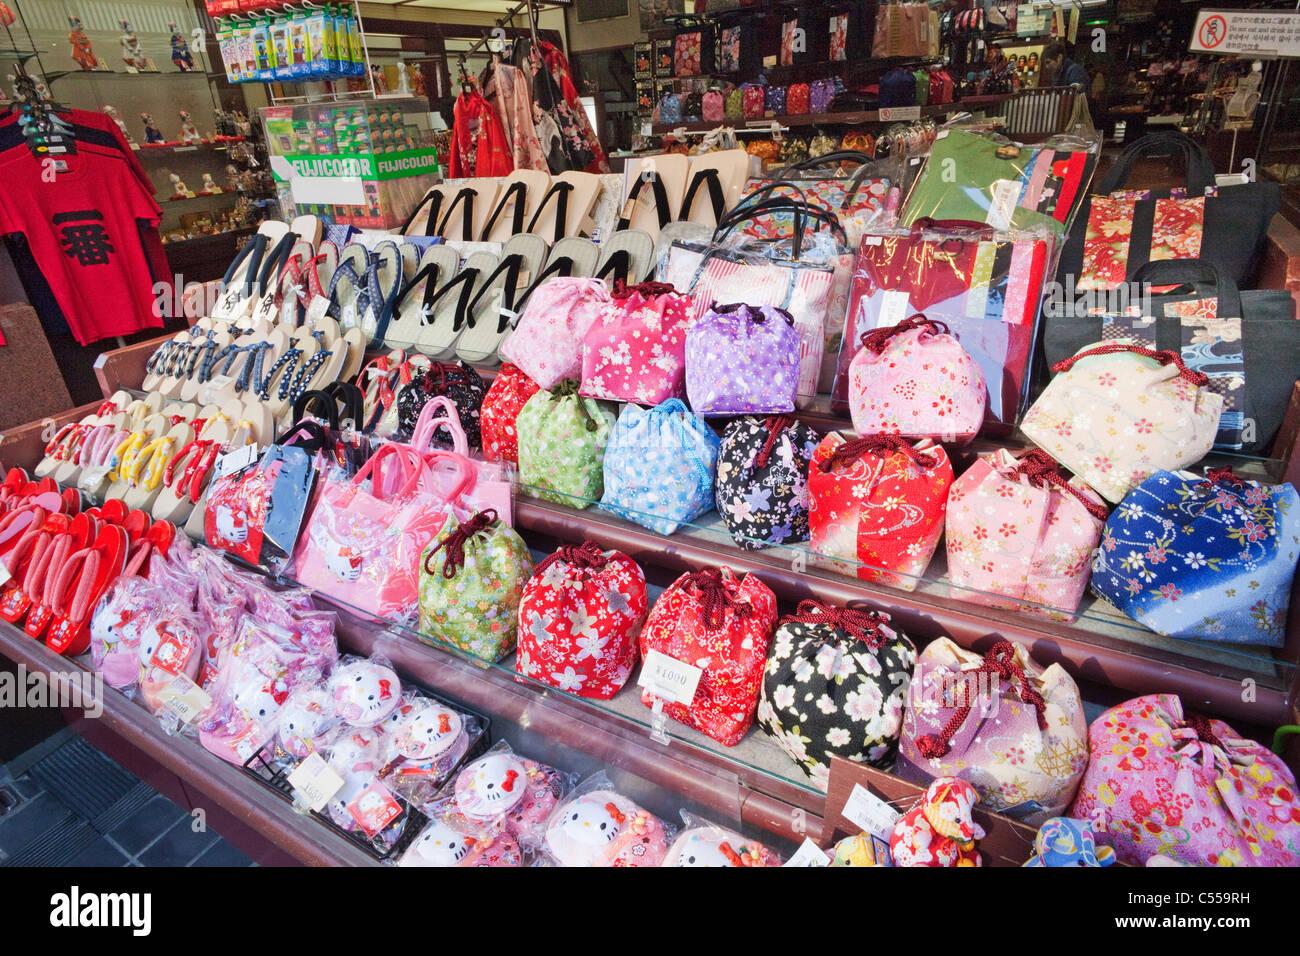 Hand bags and sandals displayed at a store, Higashiyama Ward, Kyoto Prefecture, Kinki Region, Honshu, Japan - Stock Image